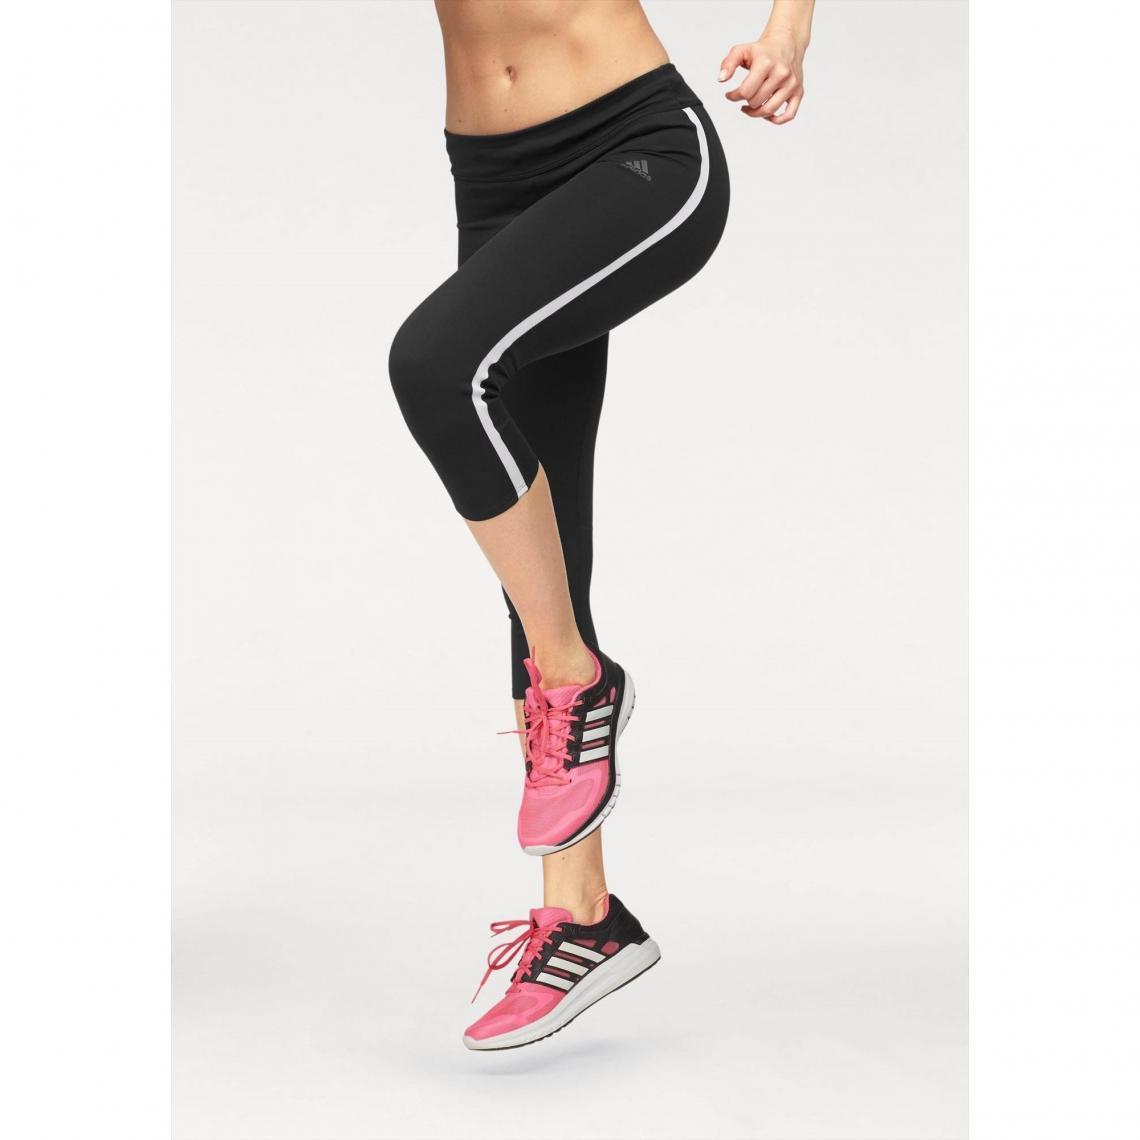 Legging 3 4 femme Climacool reg Response adidas Performance - Noir - Rose  Adidas Performance Femme 5cc0246b518